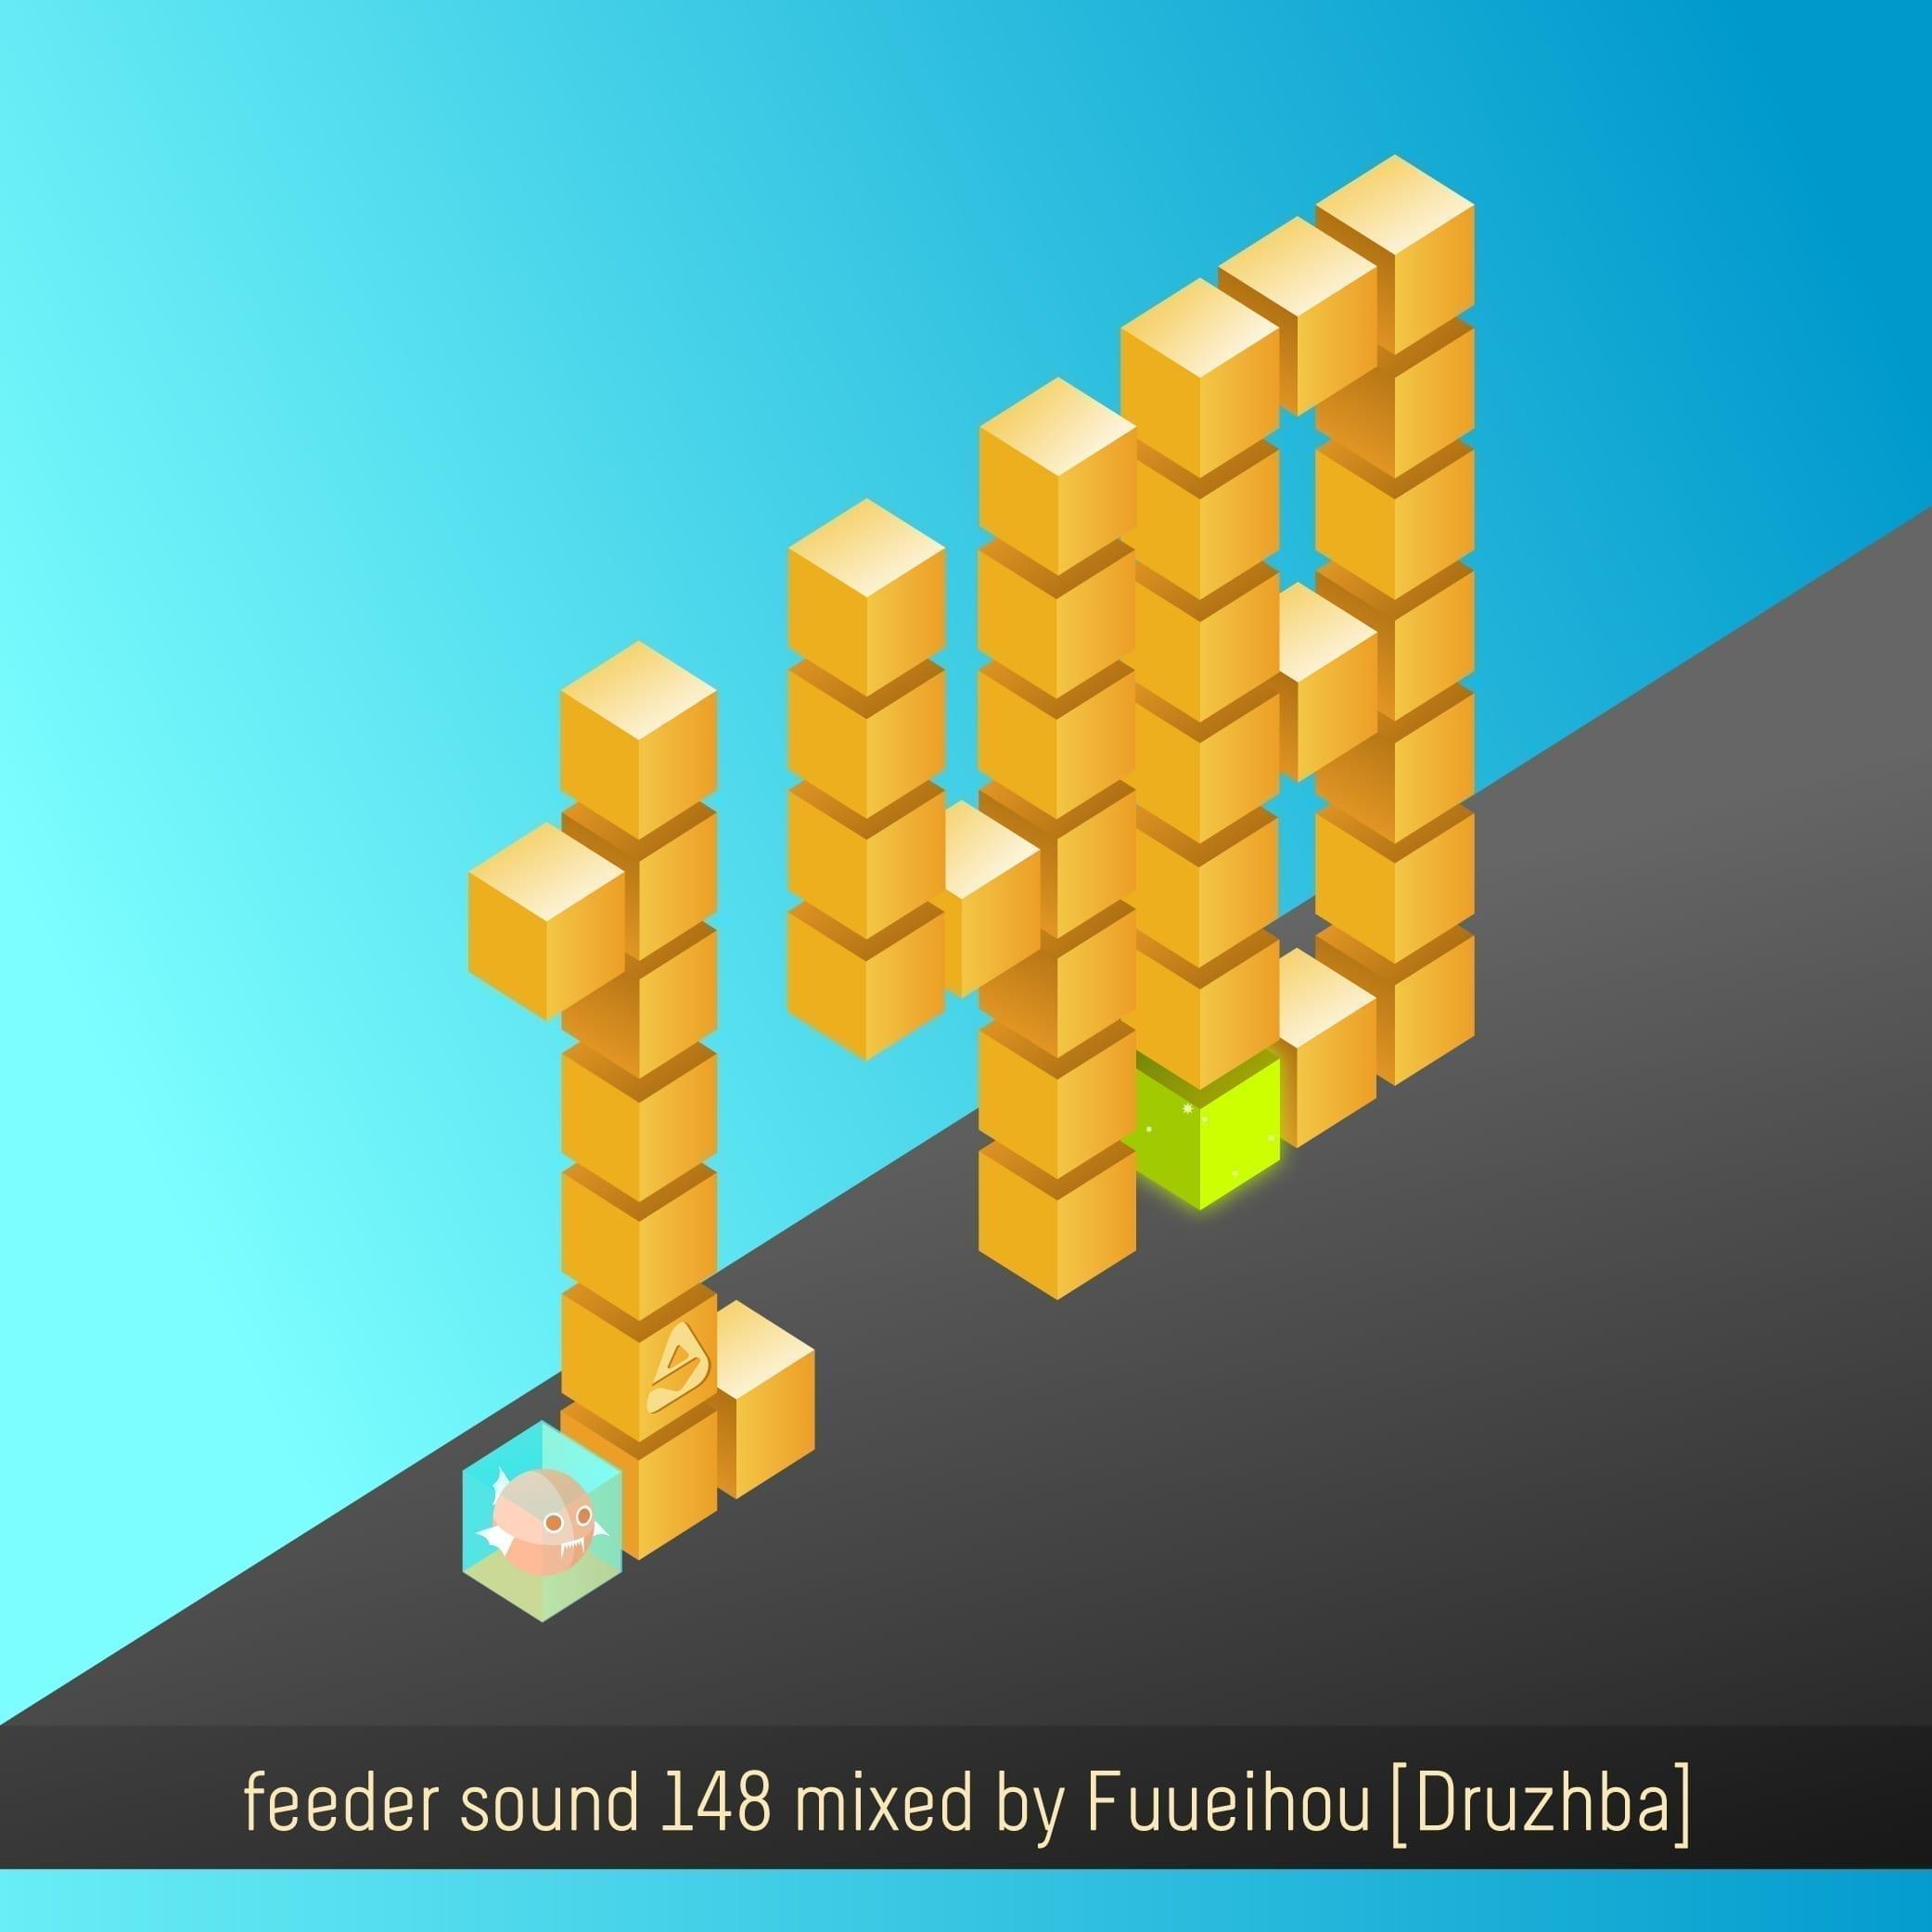 feeder sound 148 Fuueihou